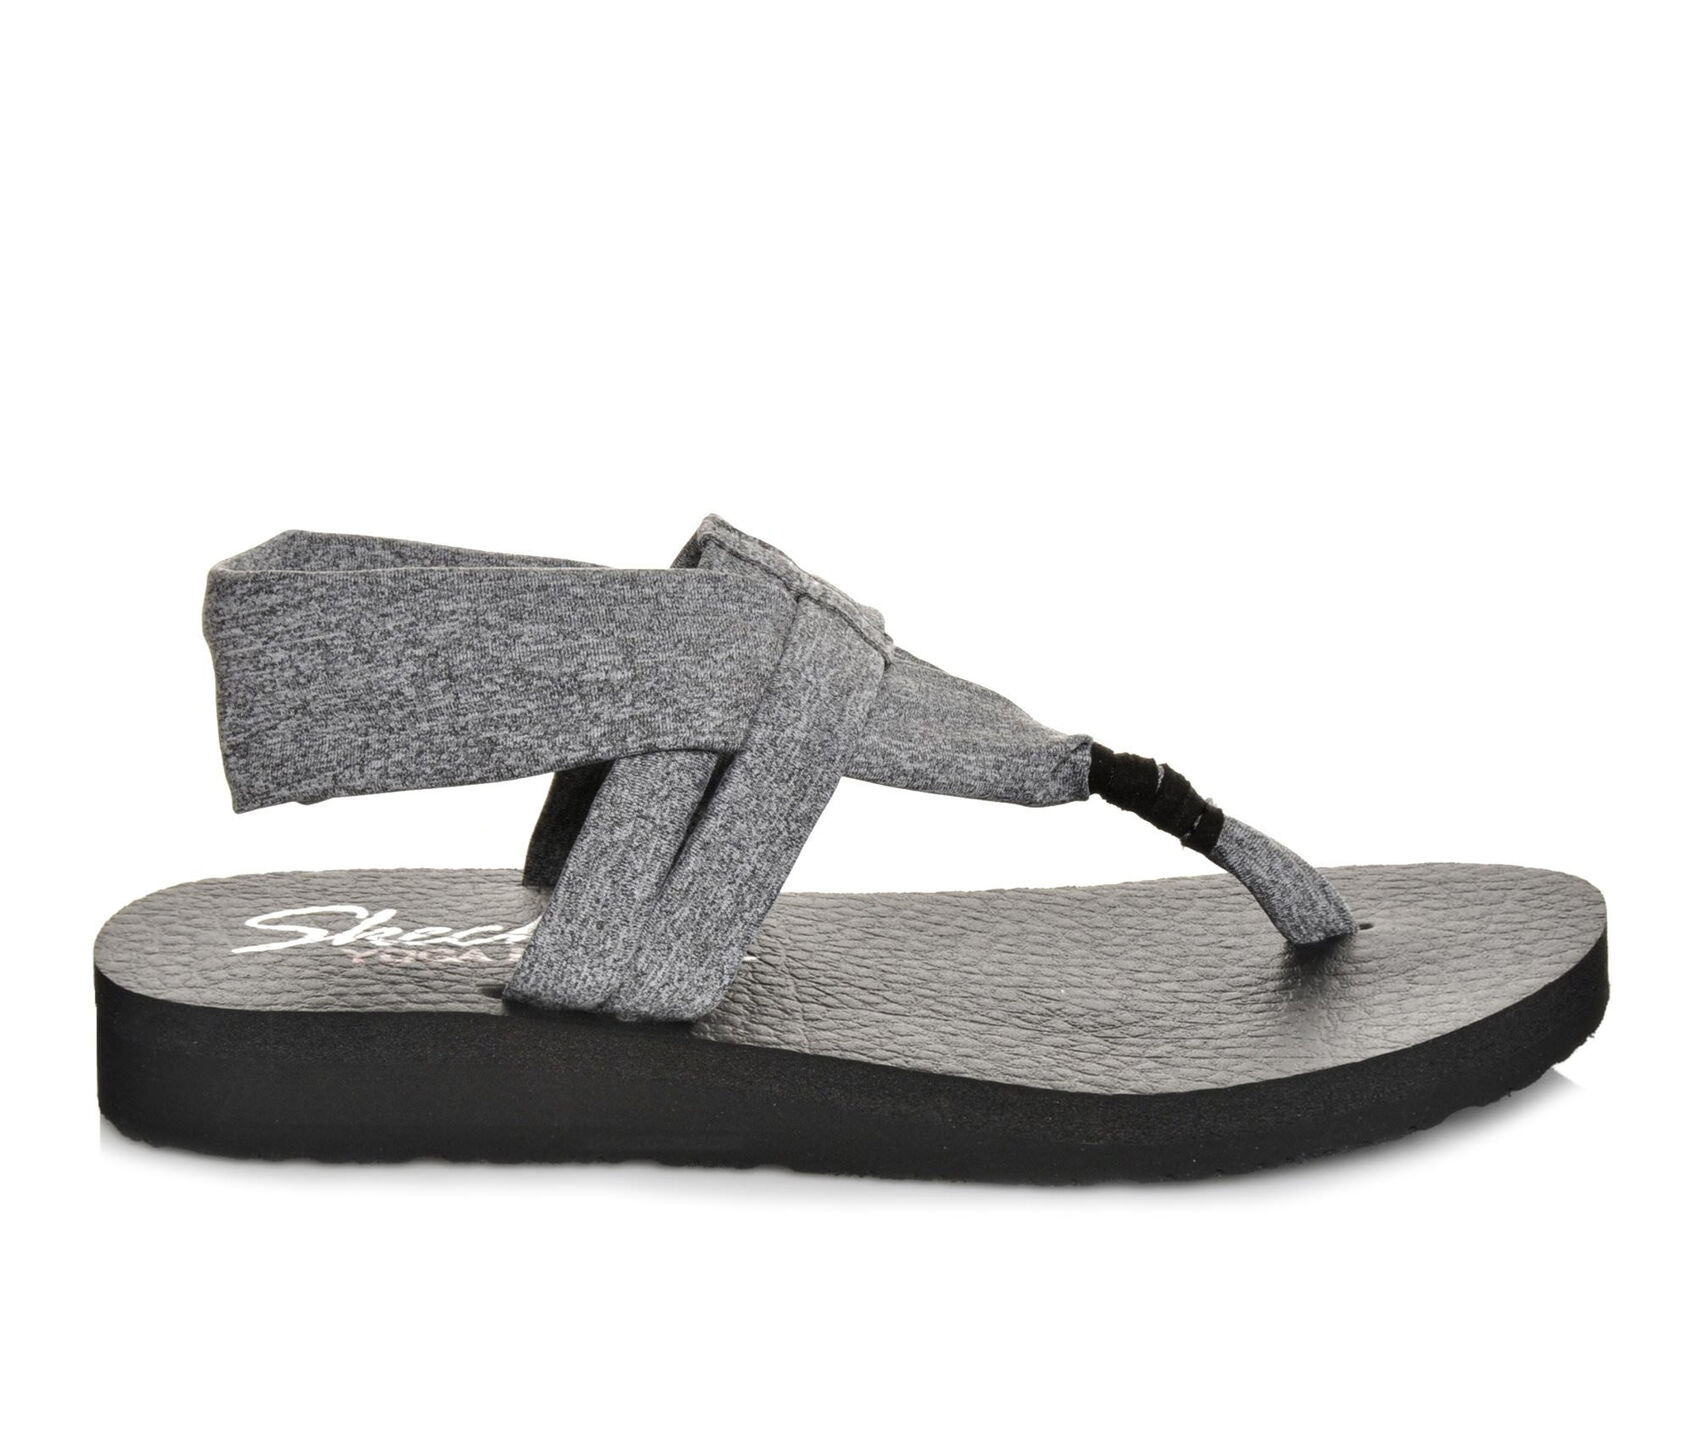 skechers yoga mat sandals. skechers yoga mat sandals l